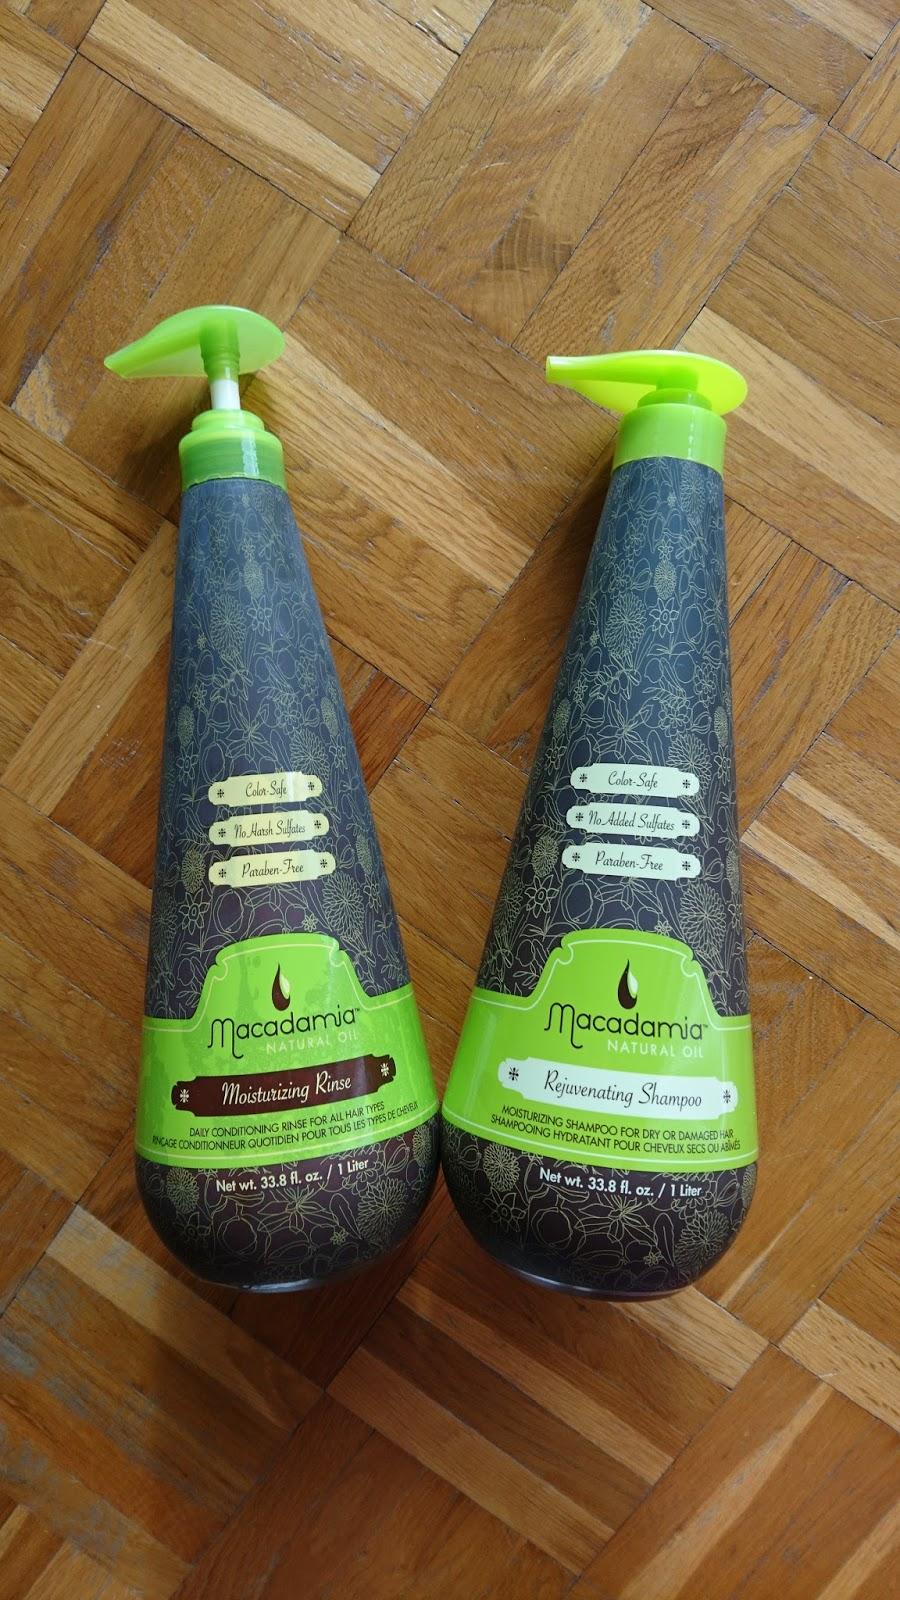 Macadamia Moisturizing Rinse & Rejuvenating Shampoo